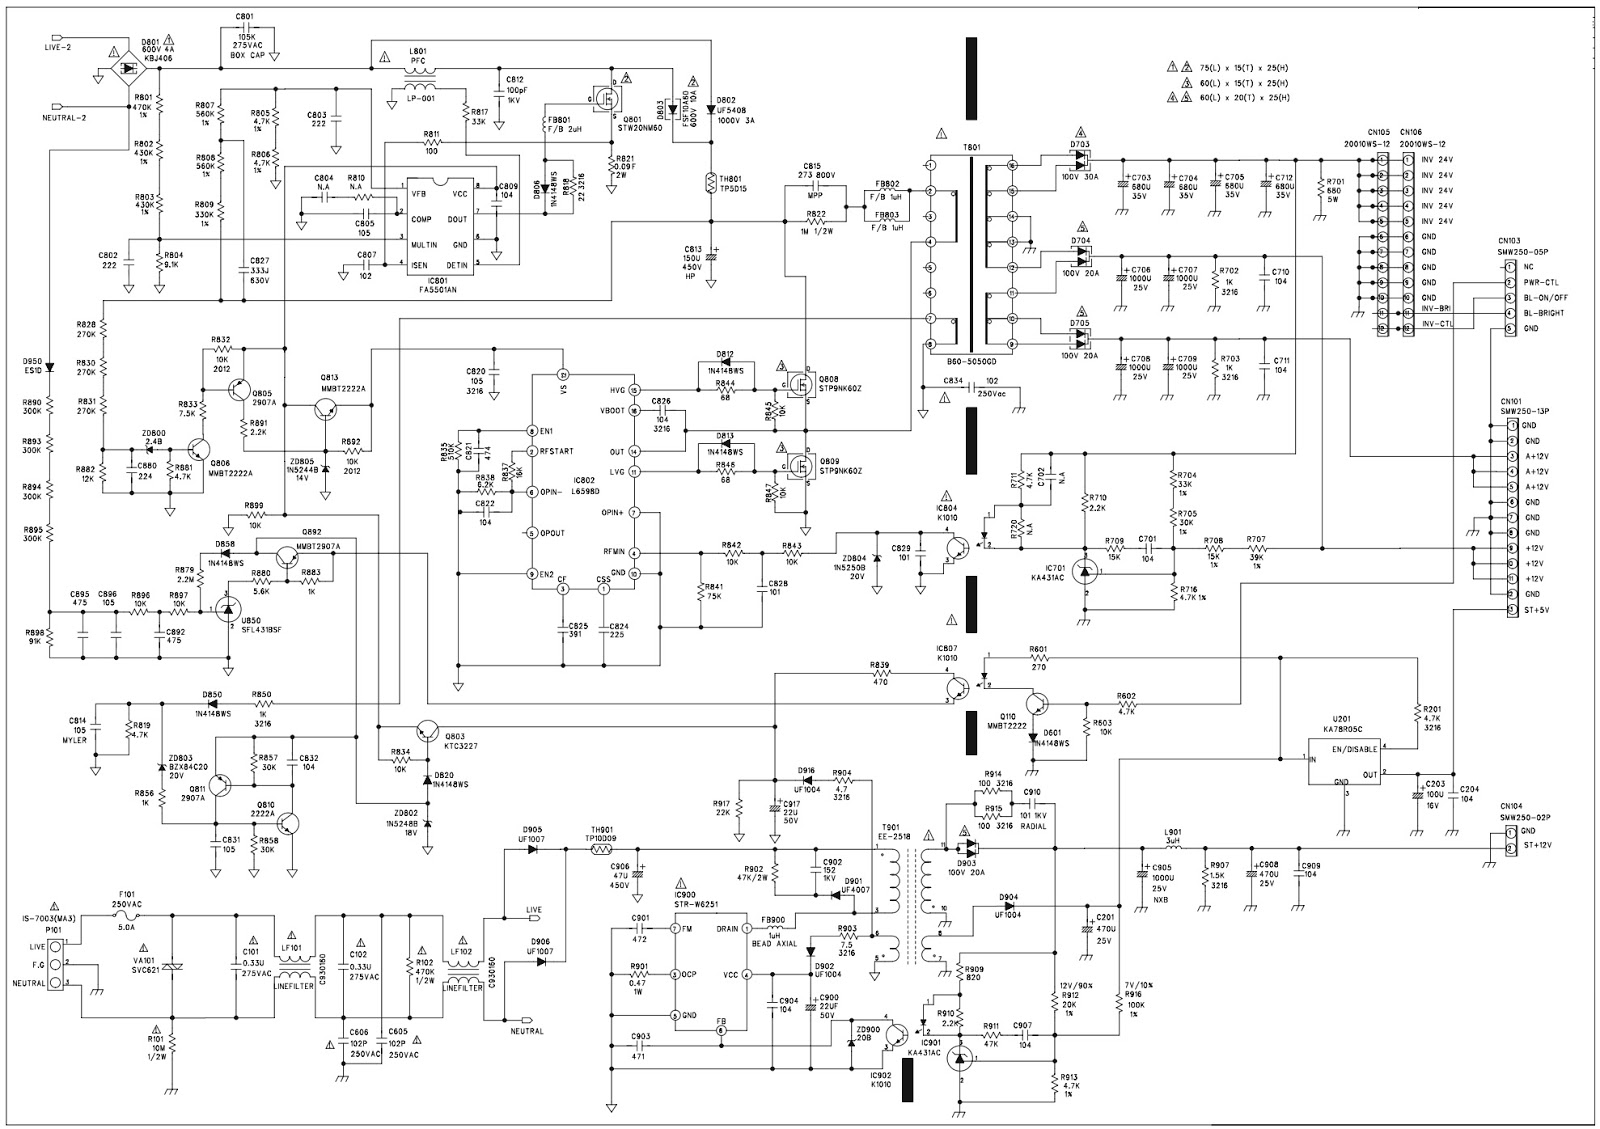 Wiring Diagram Lg Tv - DIY Wiring Diagrams •